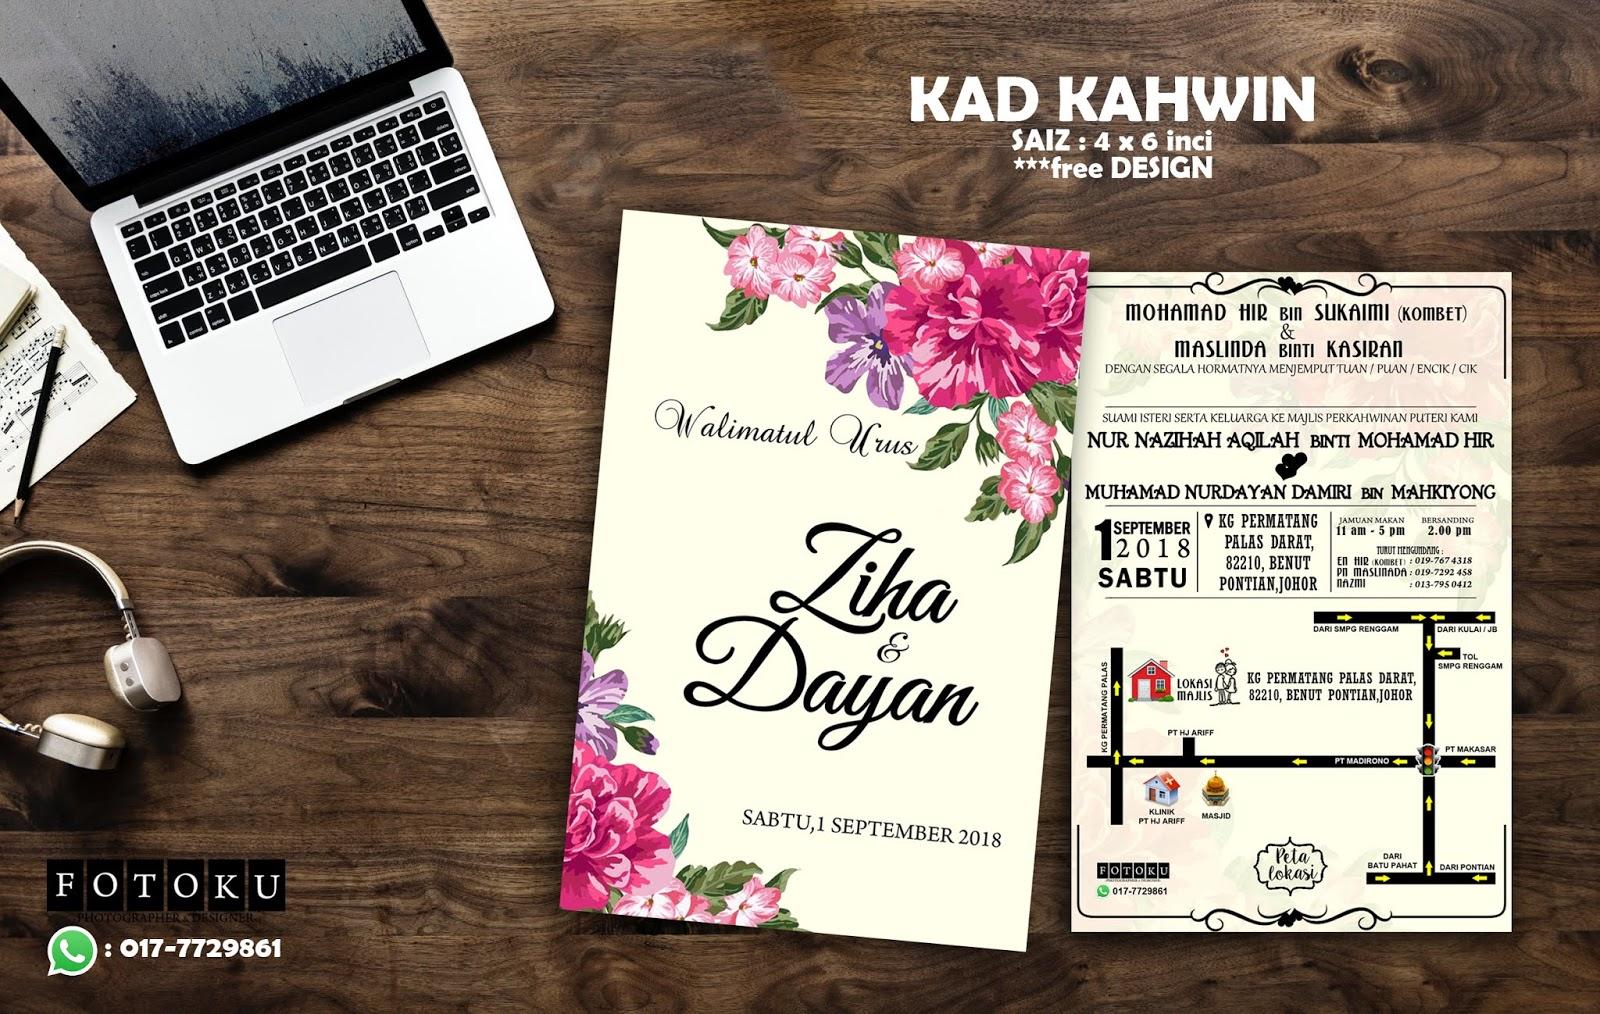 Mrs Wawa Ashihara Servis Photographer Design Printing Murah Di Johor